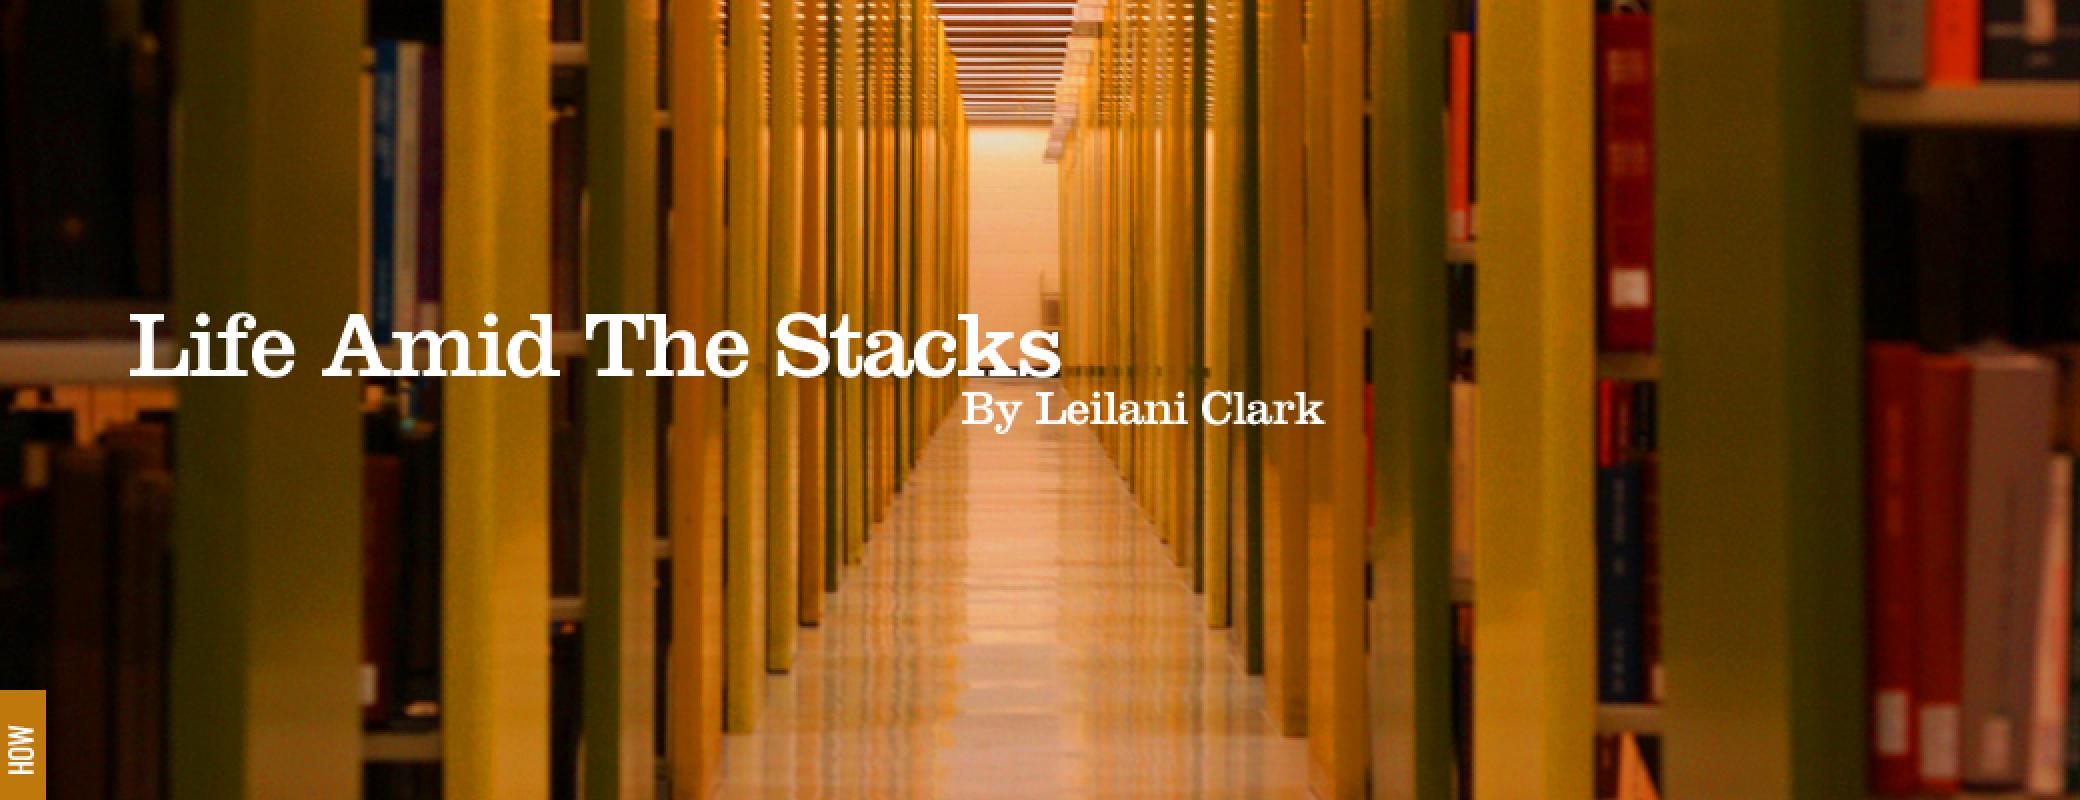 life-amid-the-stacks-by-leilani-clark@2x.jpg